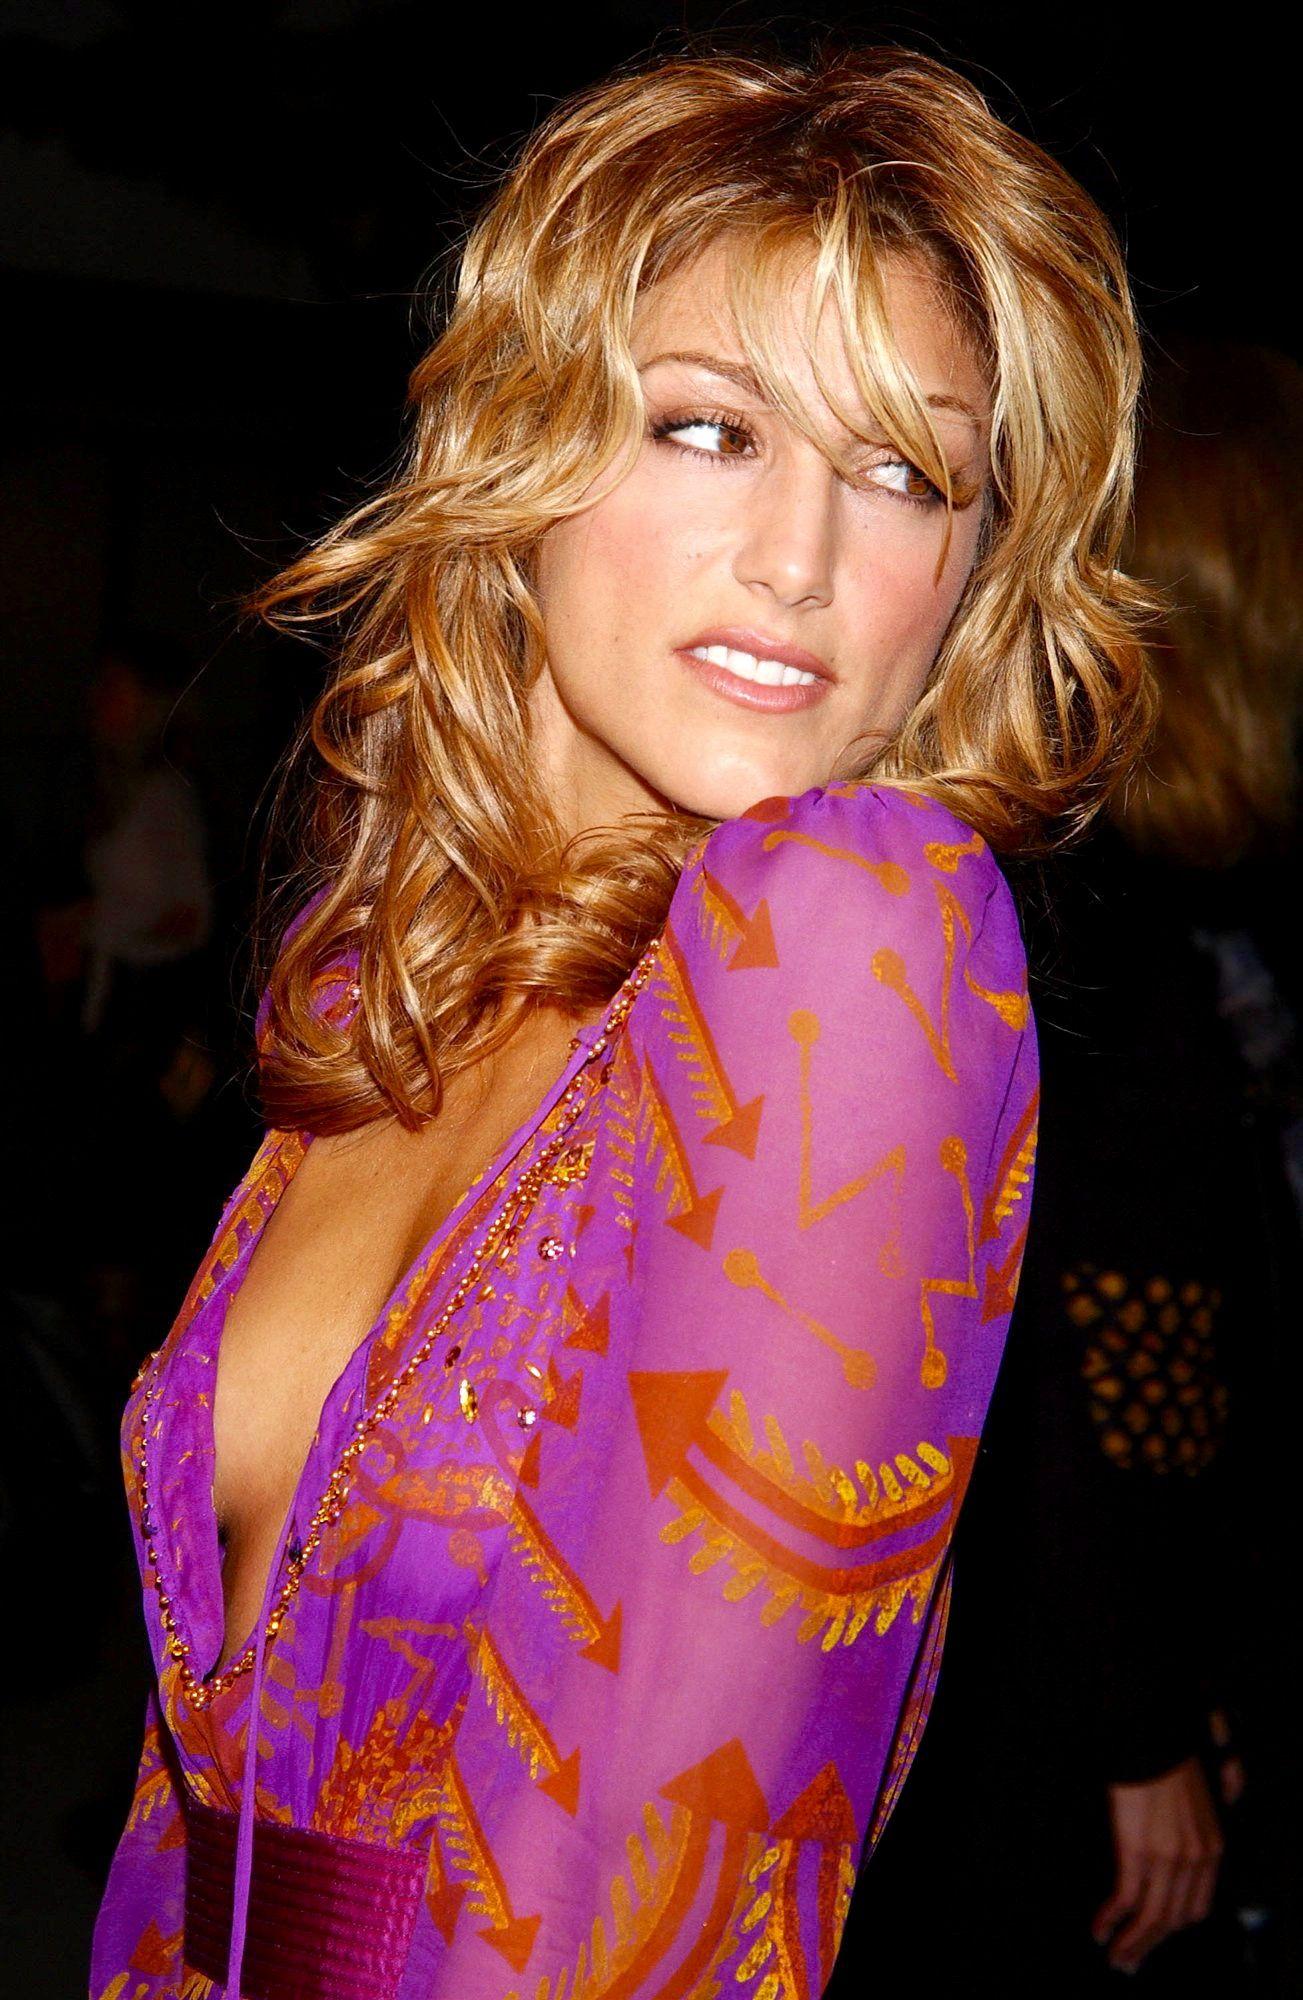 Elena Berkova Nude Photos and Videos,Heidi klum style out in new york city Adult archive Tamara Derkach Nude - 7 Photos,Nicky whelan naked